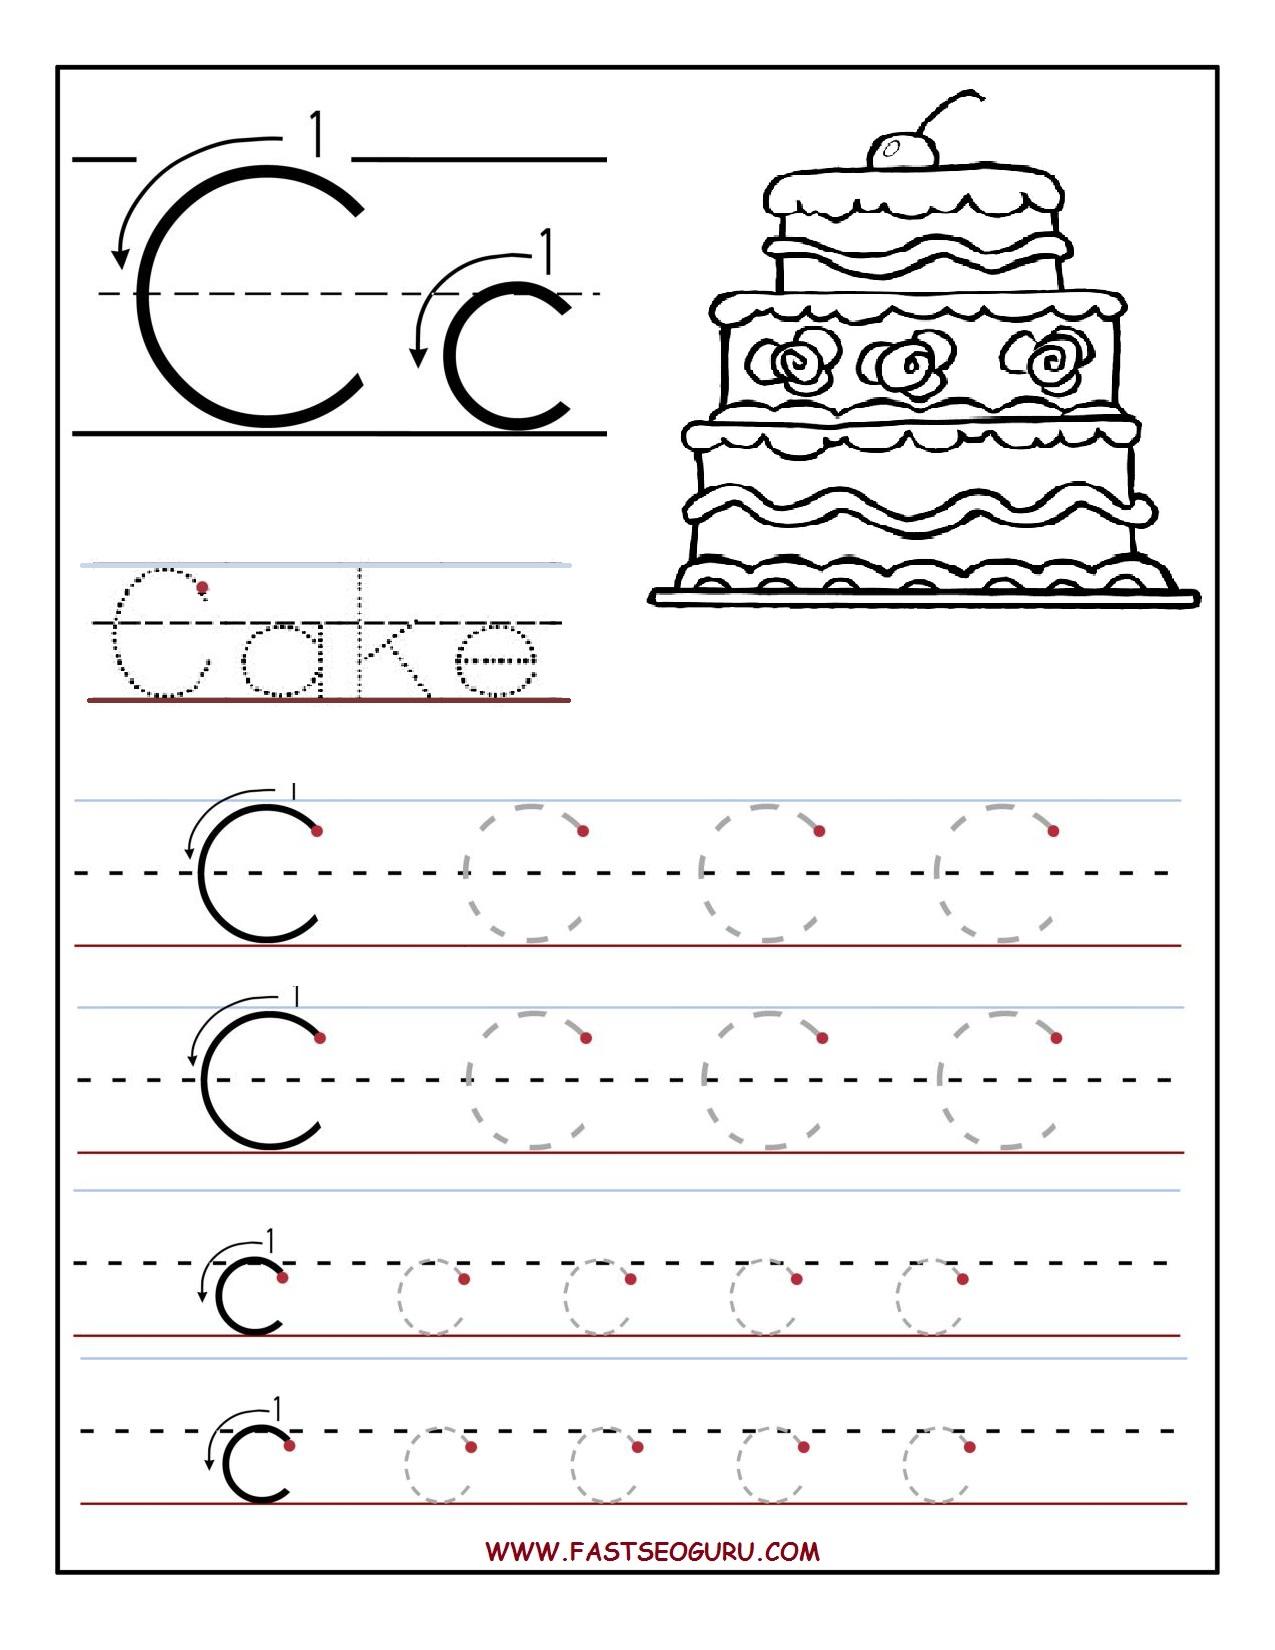 Printables Free Printable Letter Recognition Worksheets free printable letter recognition worksheets vintagegrn mysticfudge